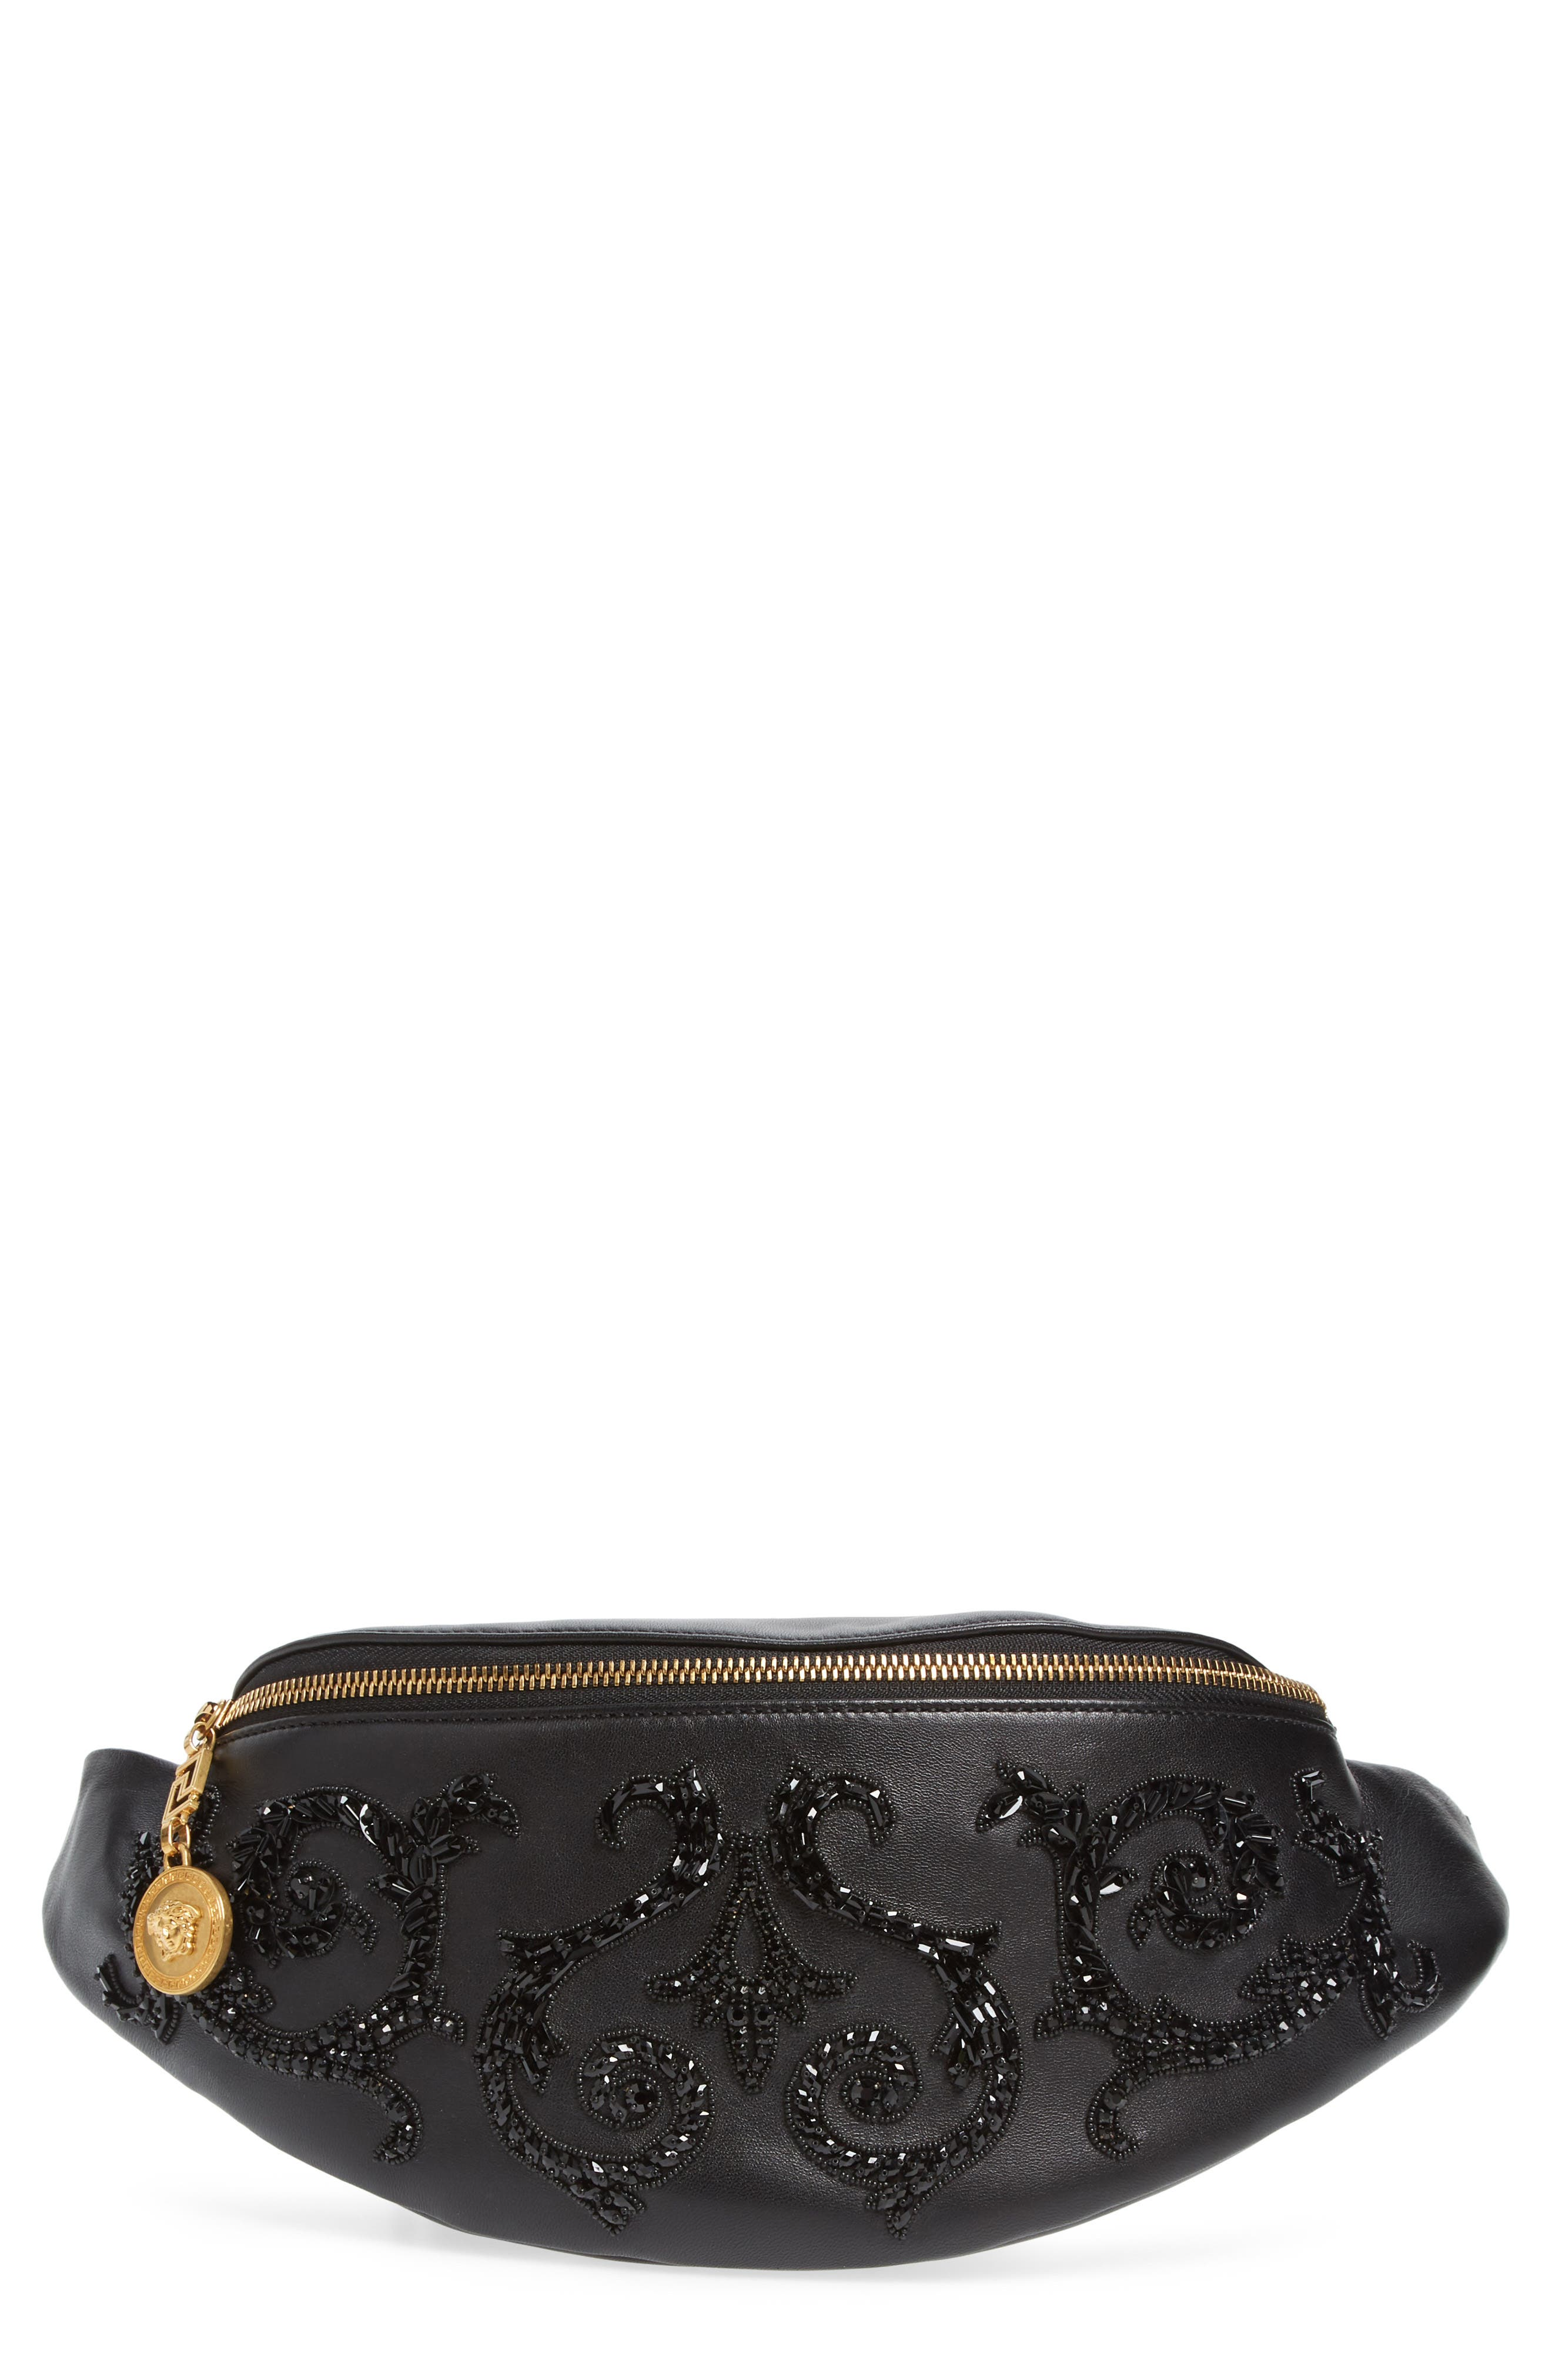 VERSACE COLLECTION Versace Crystal Embellished Leather Belt Bag, Main, color, NERO